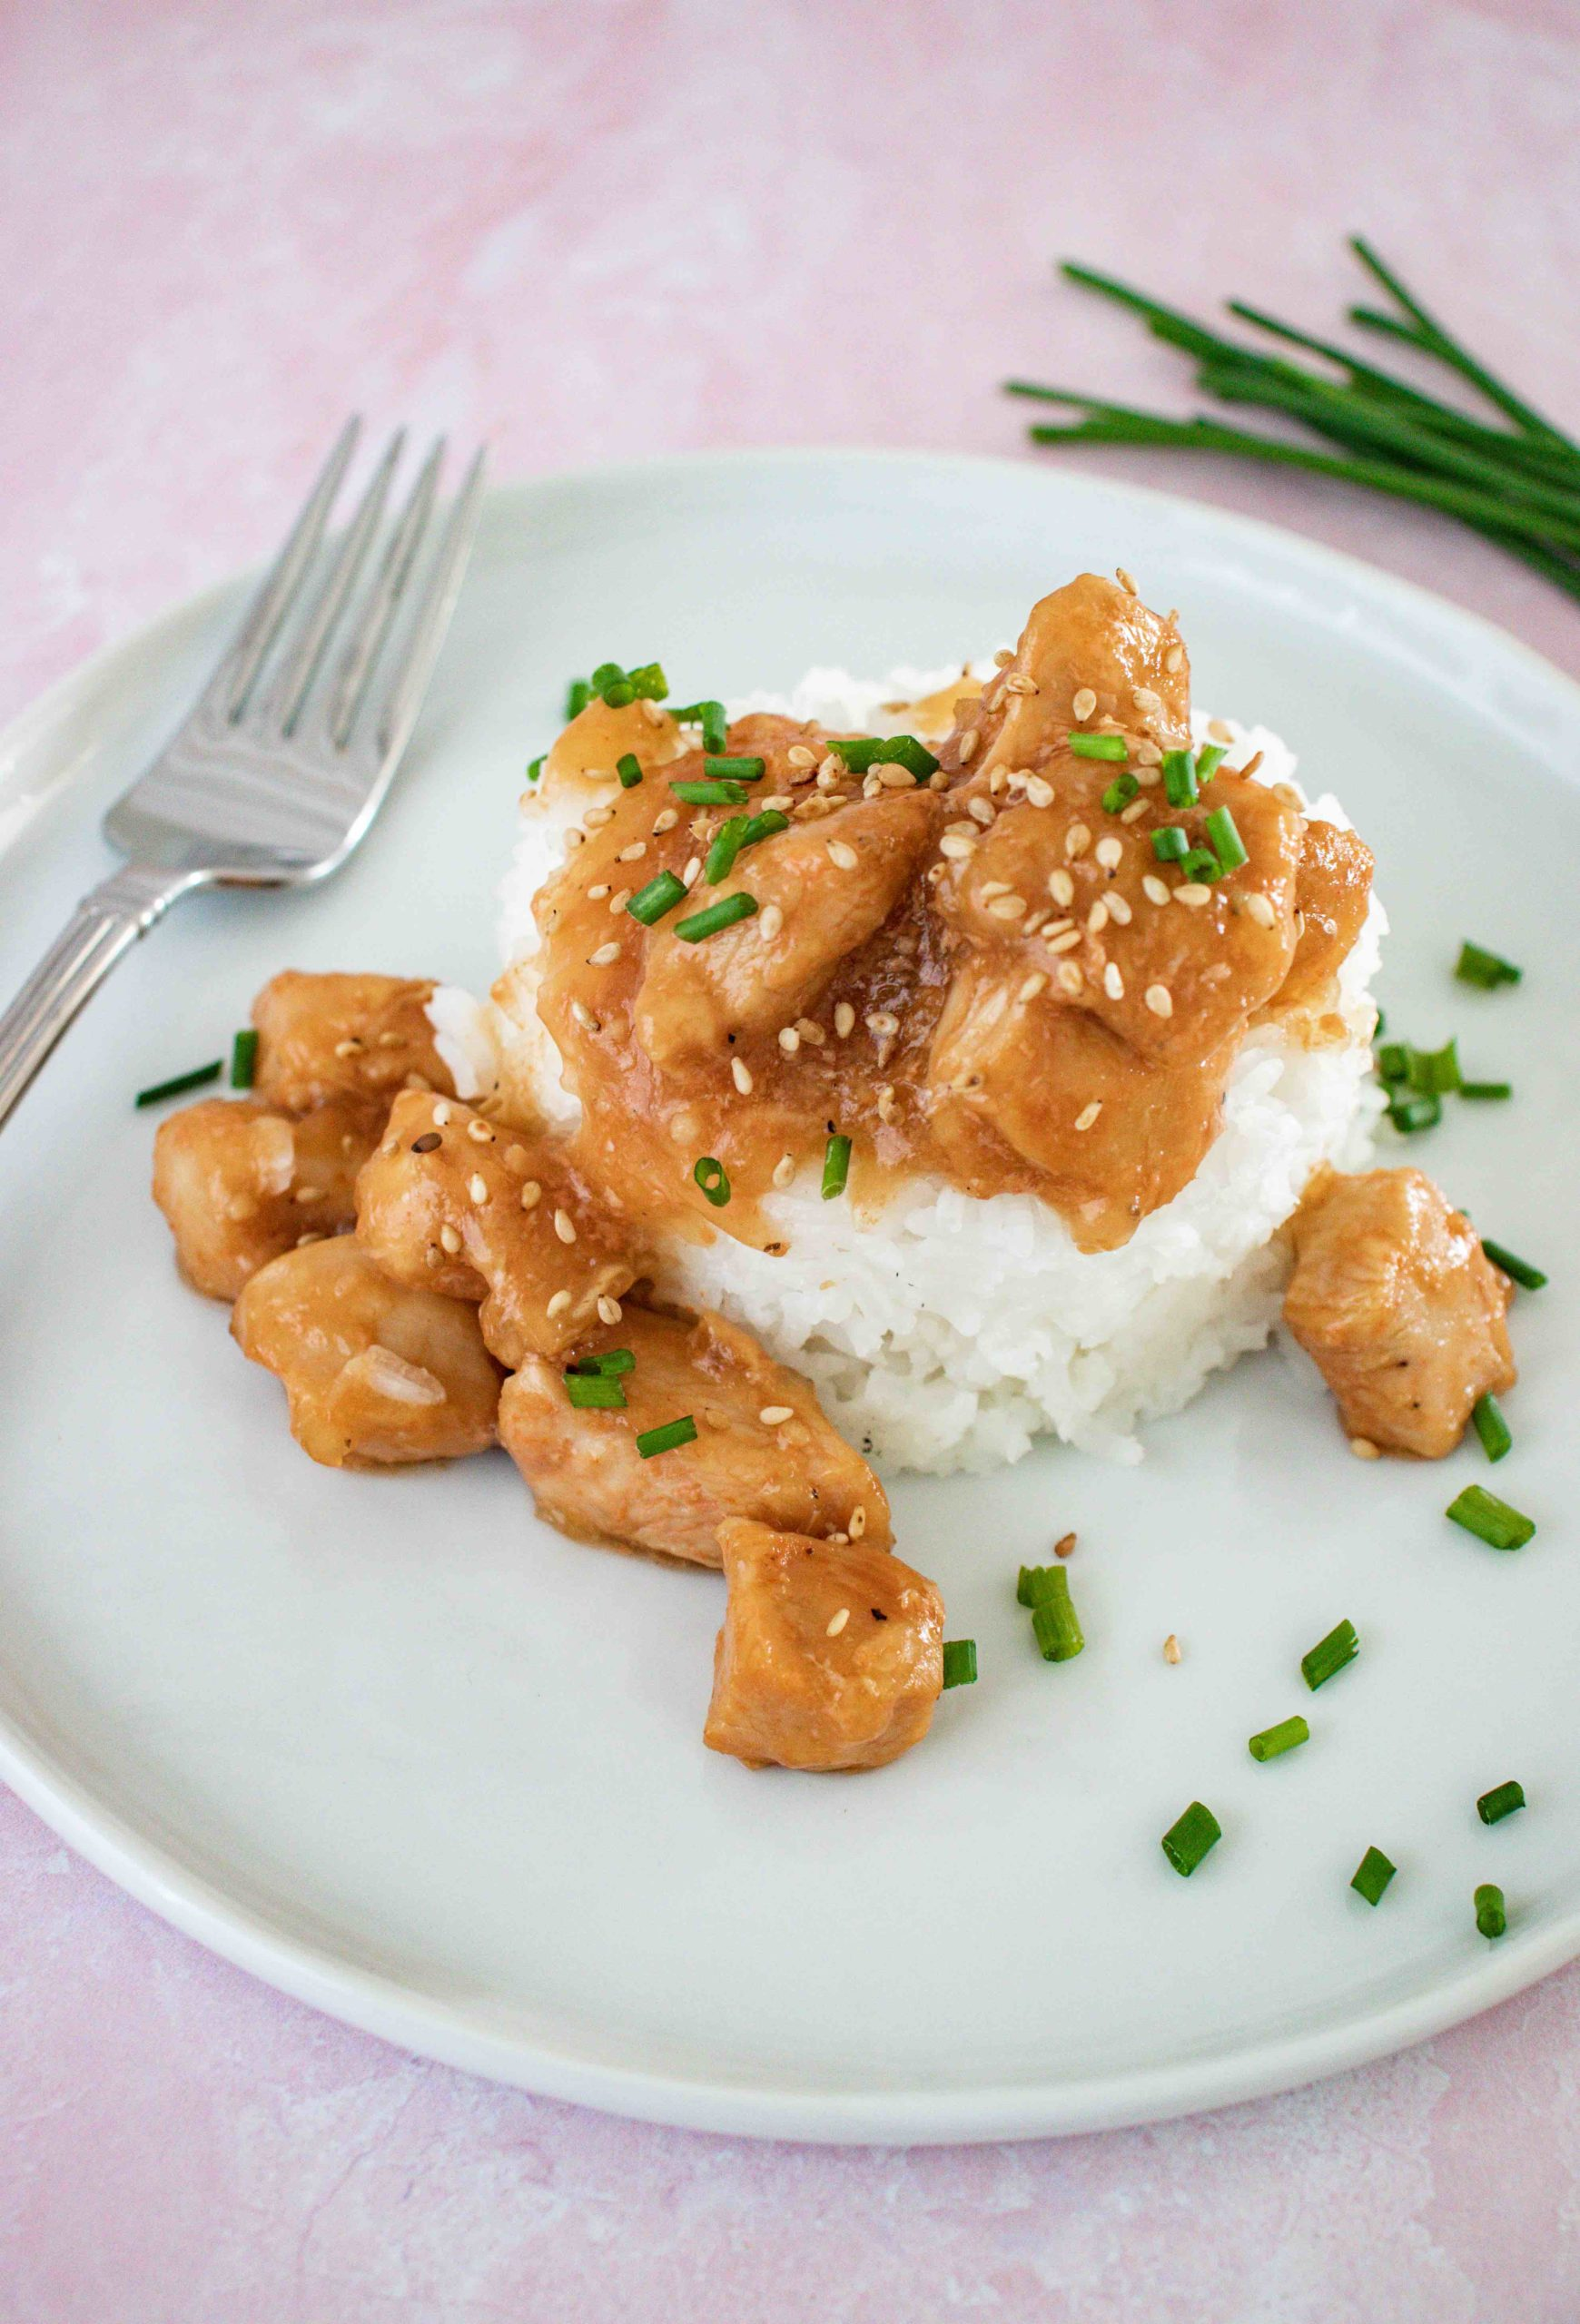 Instant Pot Teriyaki Chicken Recipe by top Hawaii Blog Hawaii Travel with Kids